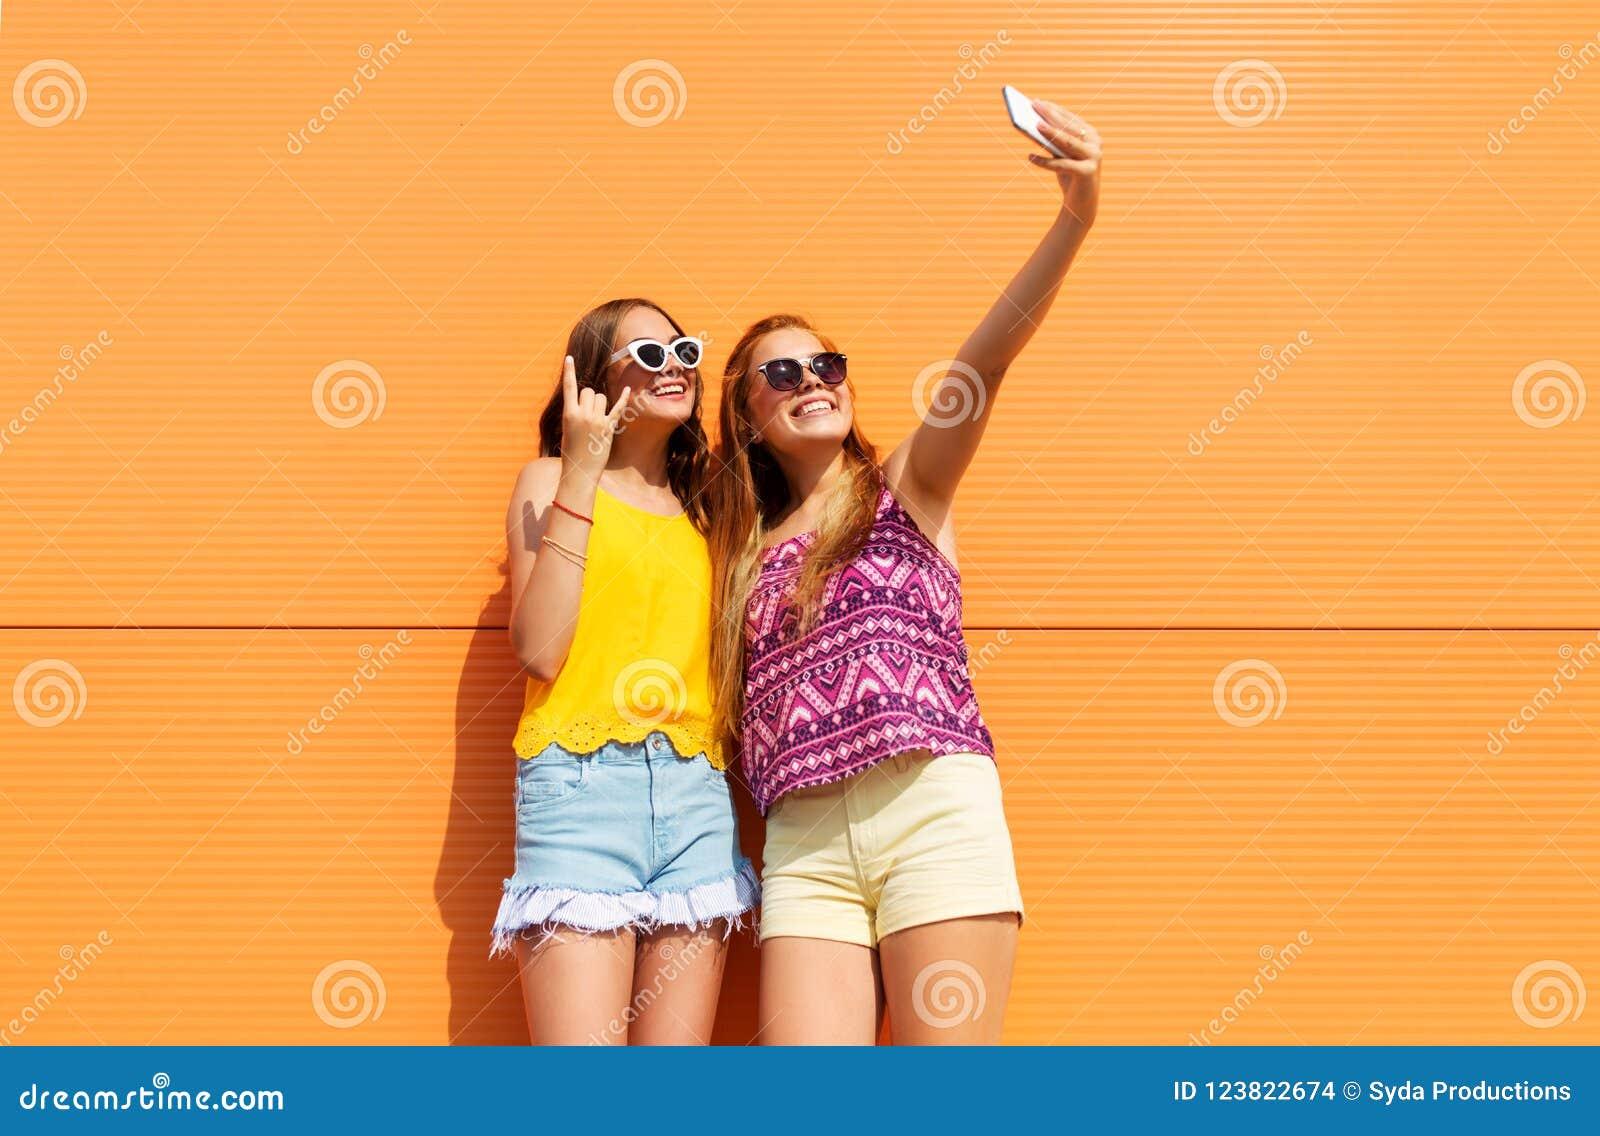 Teen girls taking selfie by smartphone in summer